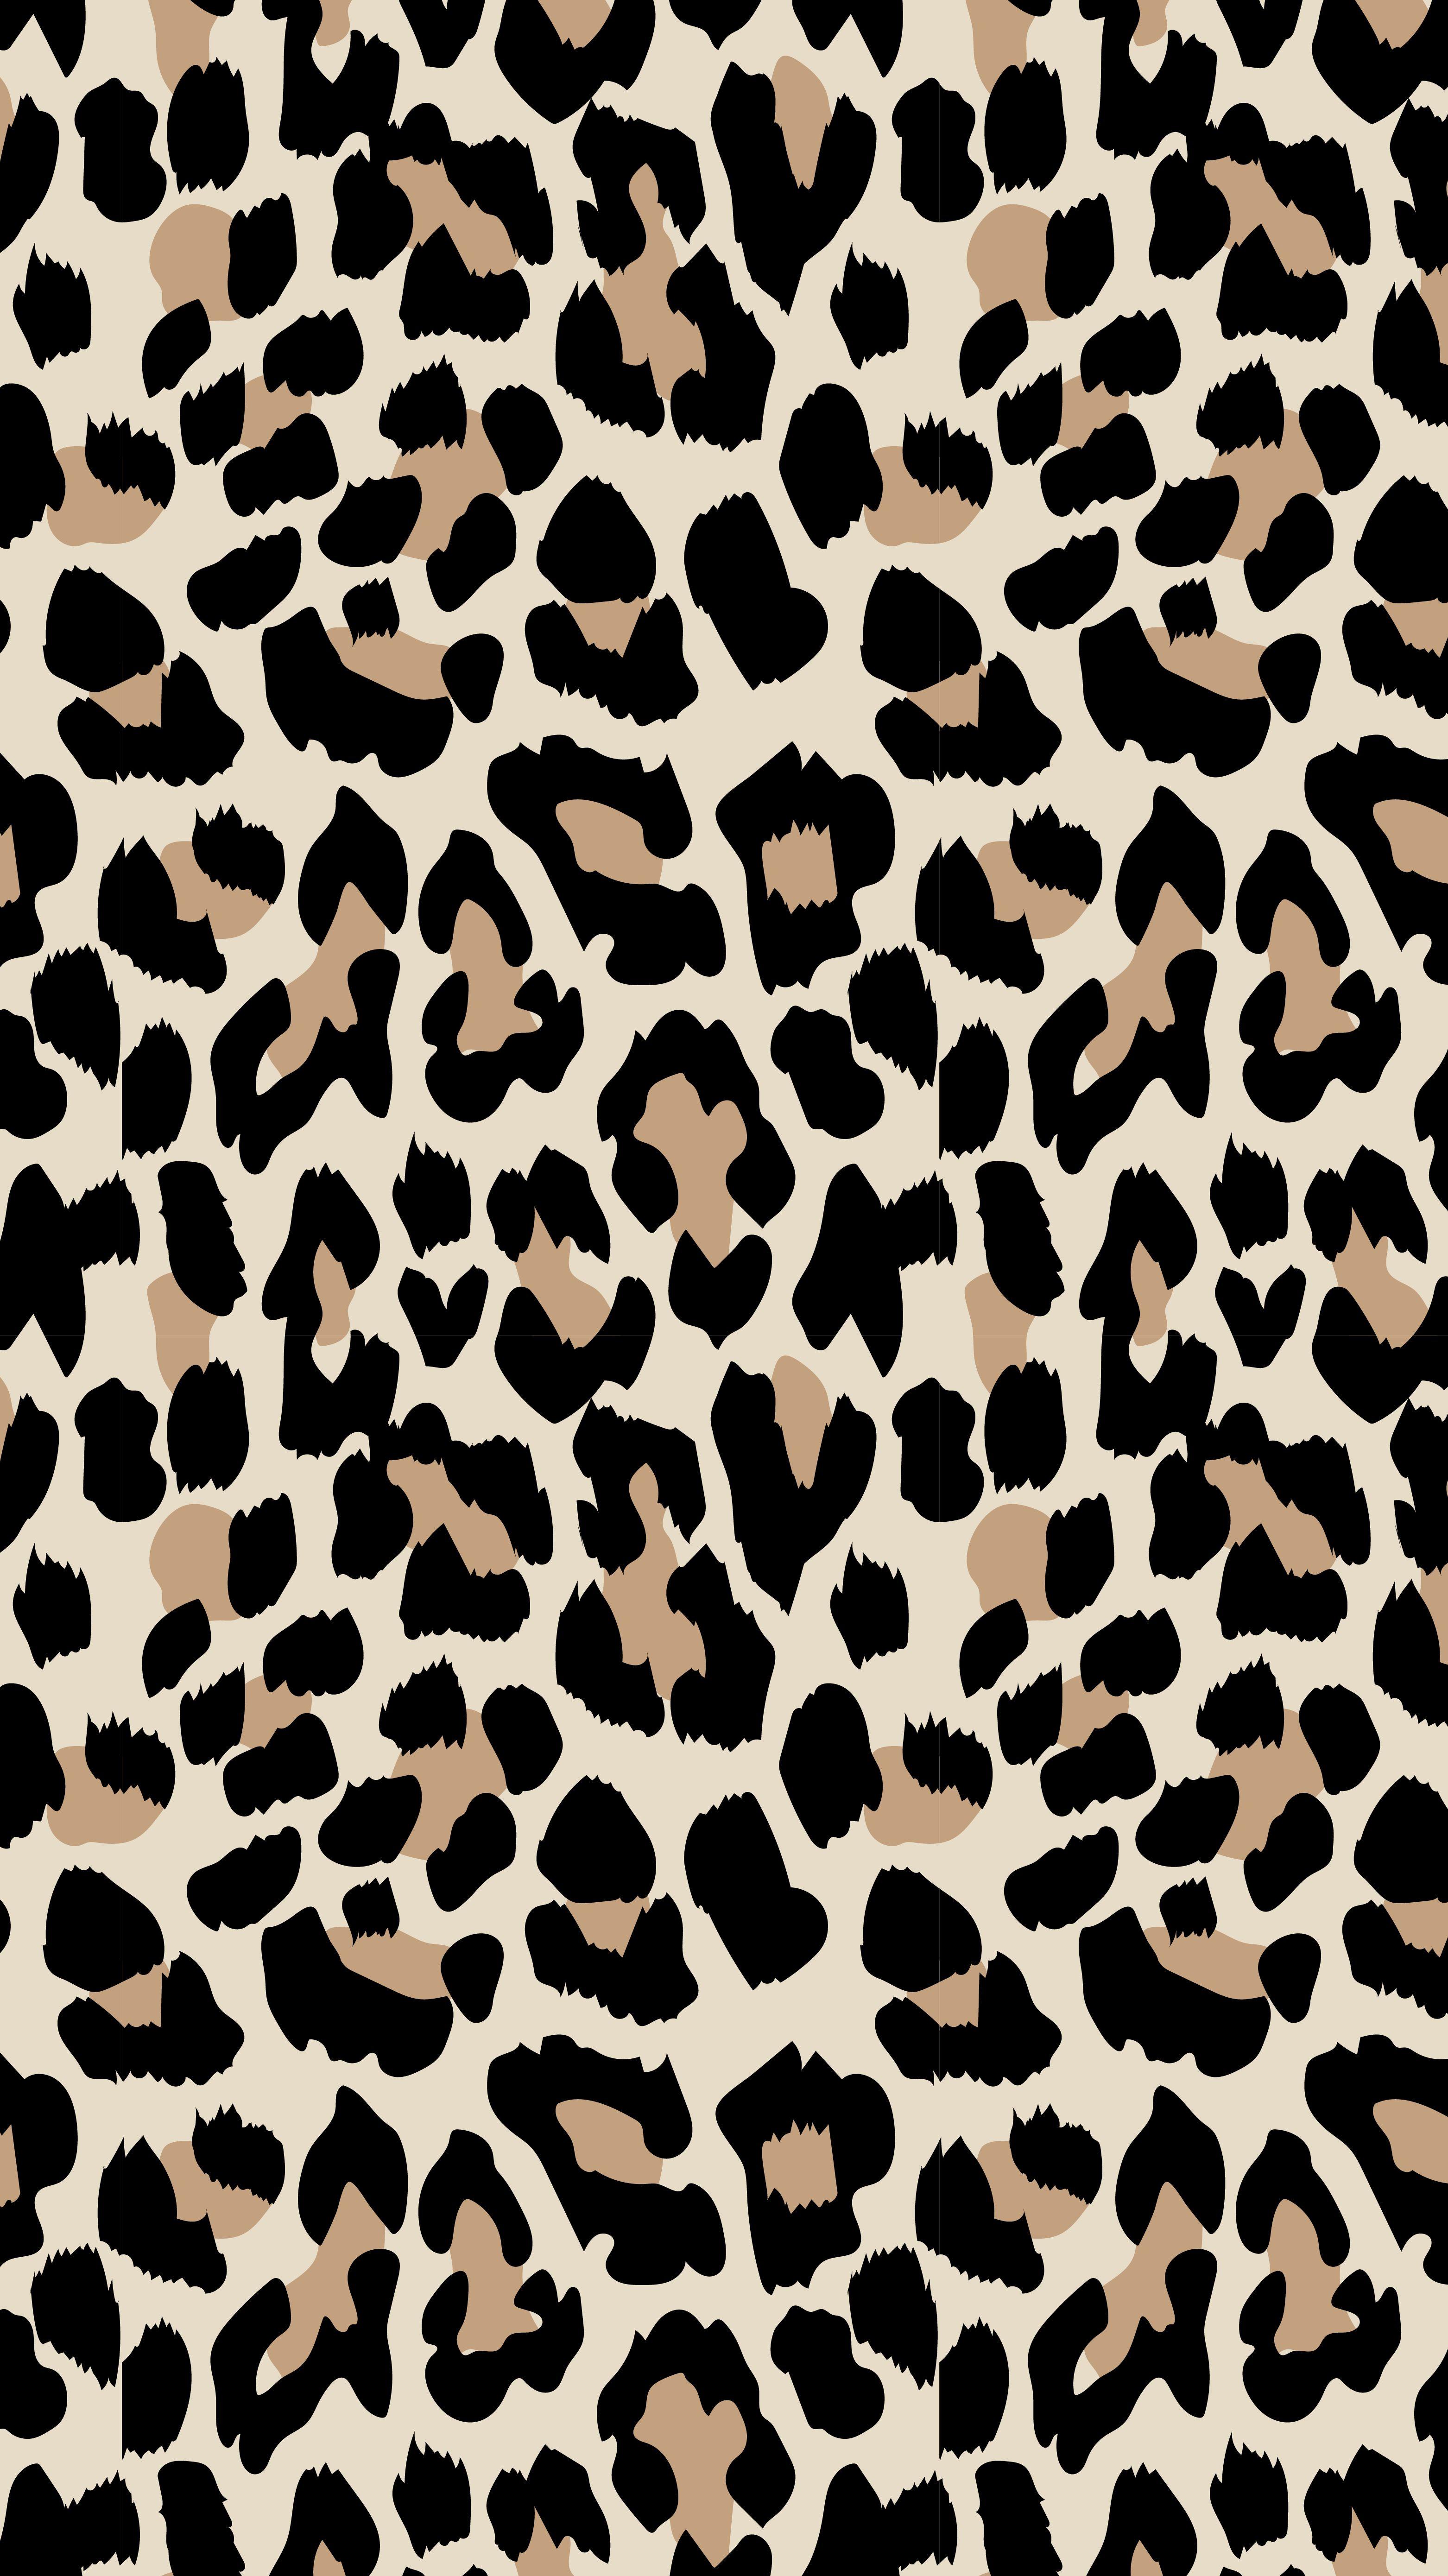 Pin By Makyla On Prints Cheetah Print Wallpaper Animal Print Wallpaper Print Wallpaper